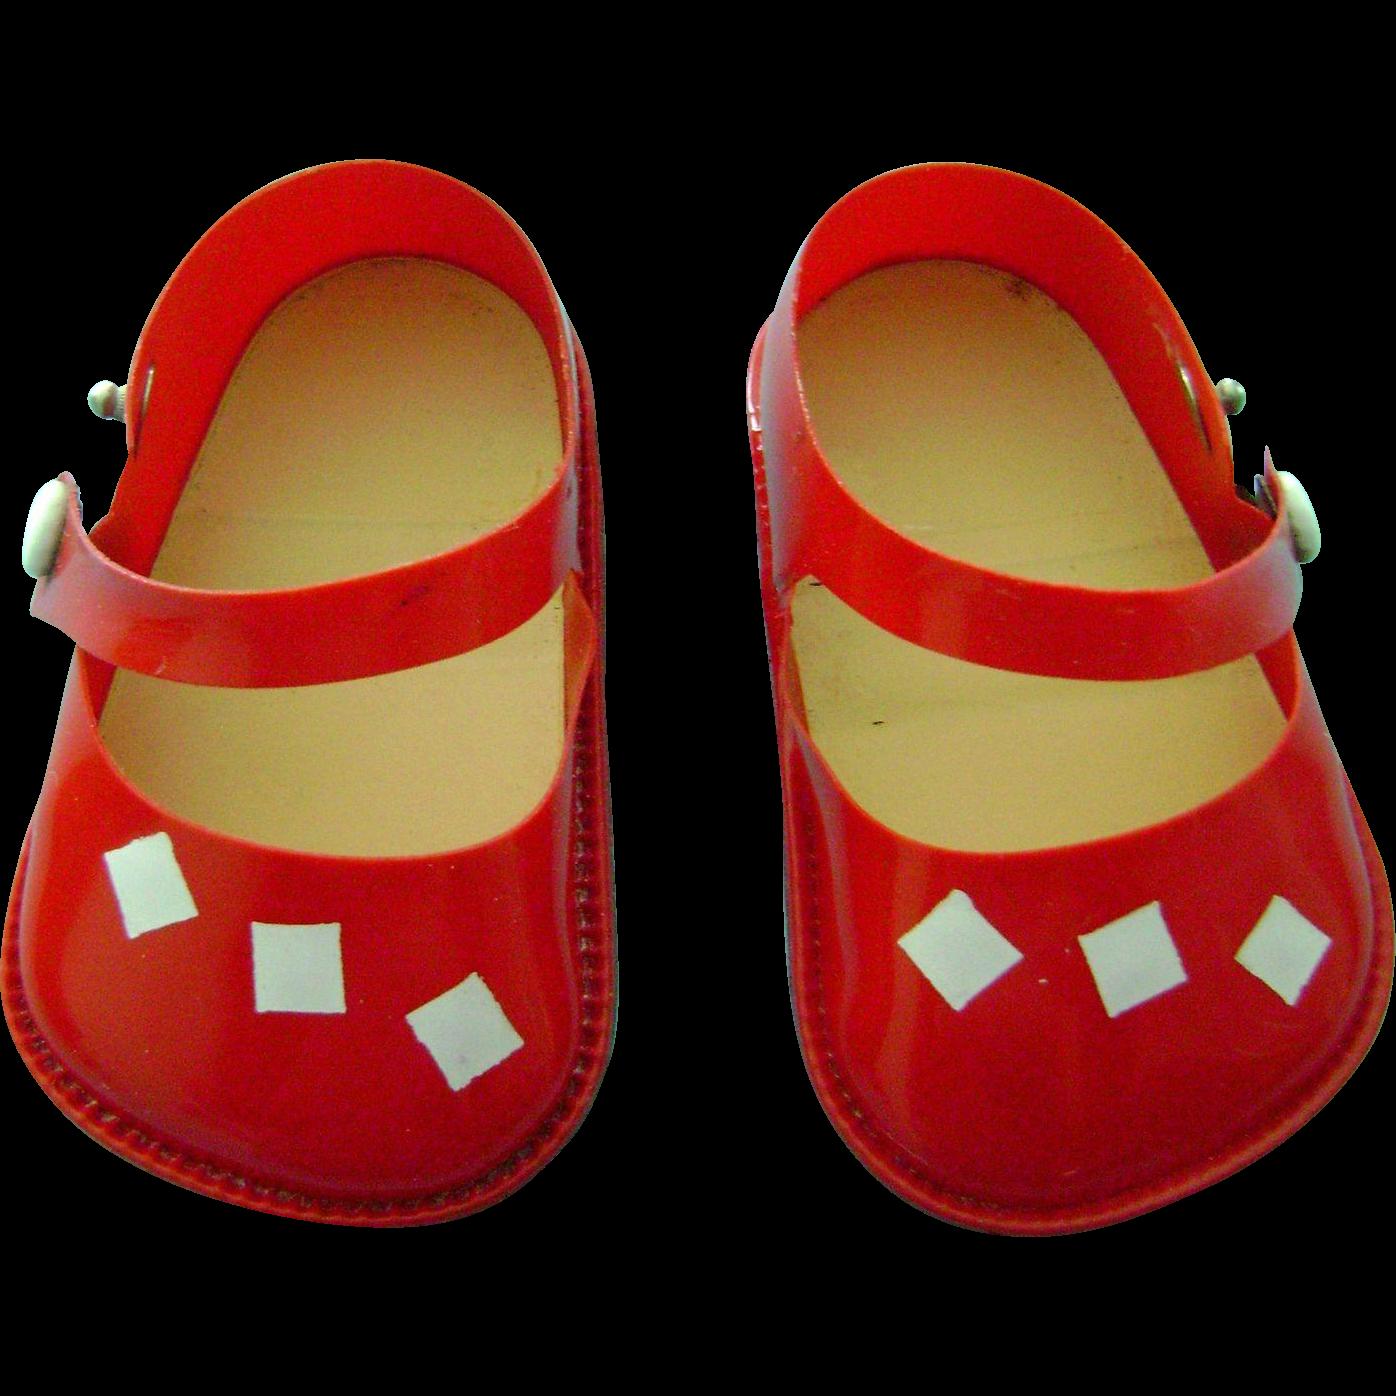 Vintage German Turtle Mark Celluloid Doll Shoes Kathe Kruse Germany